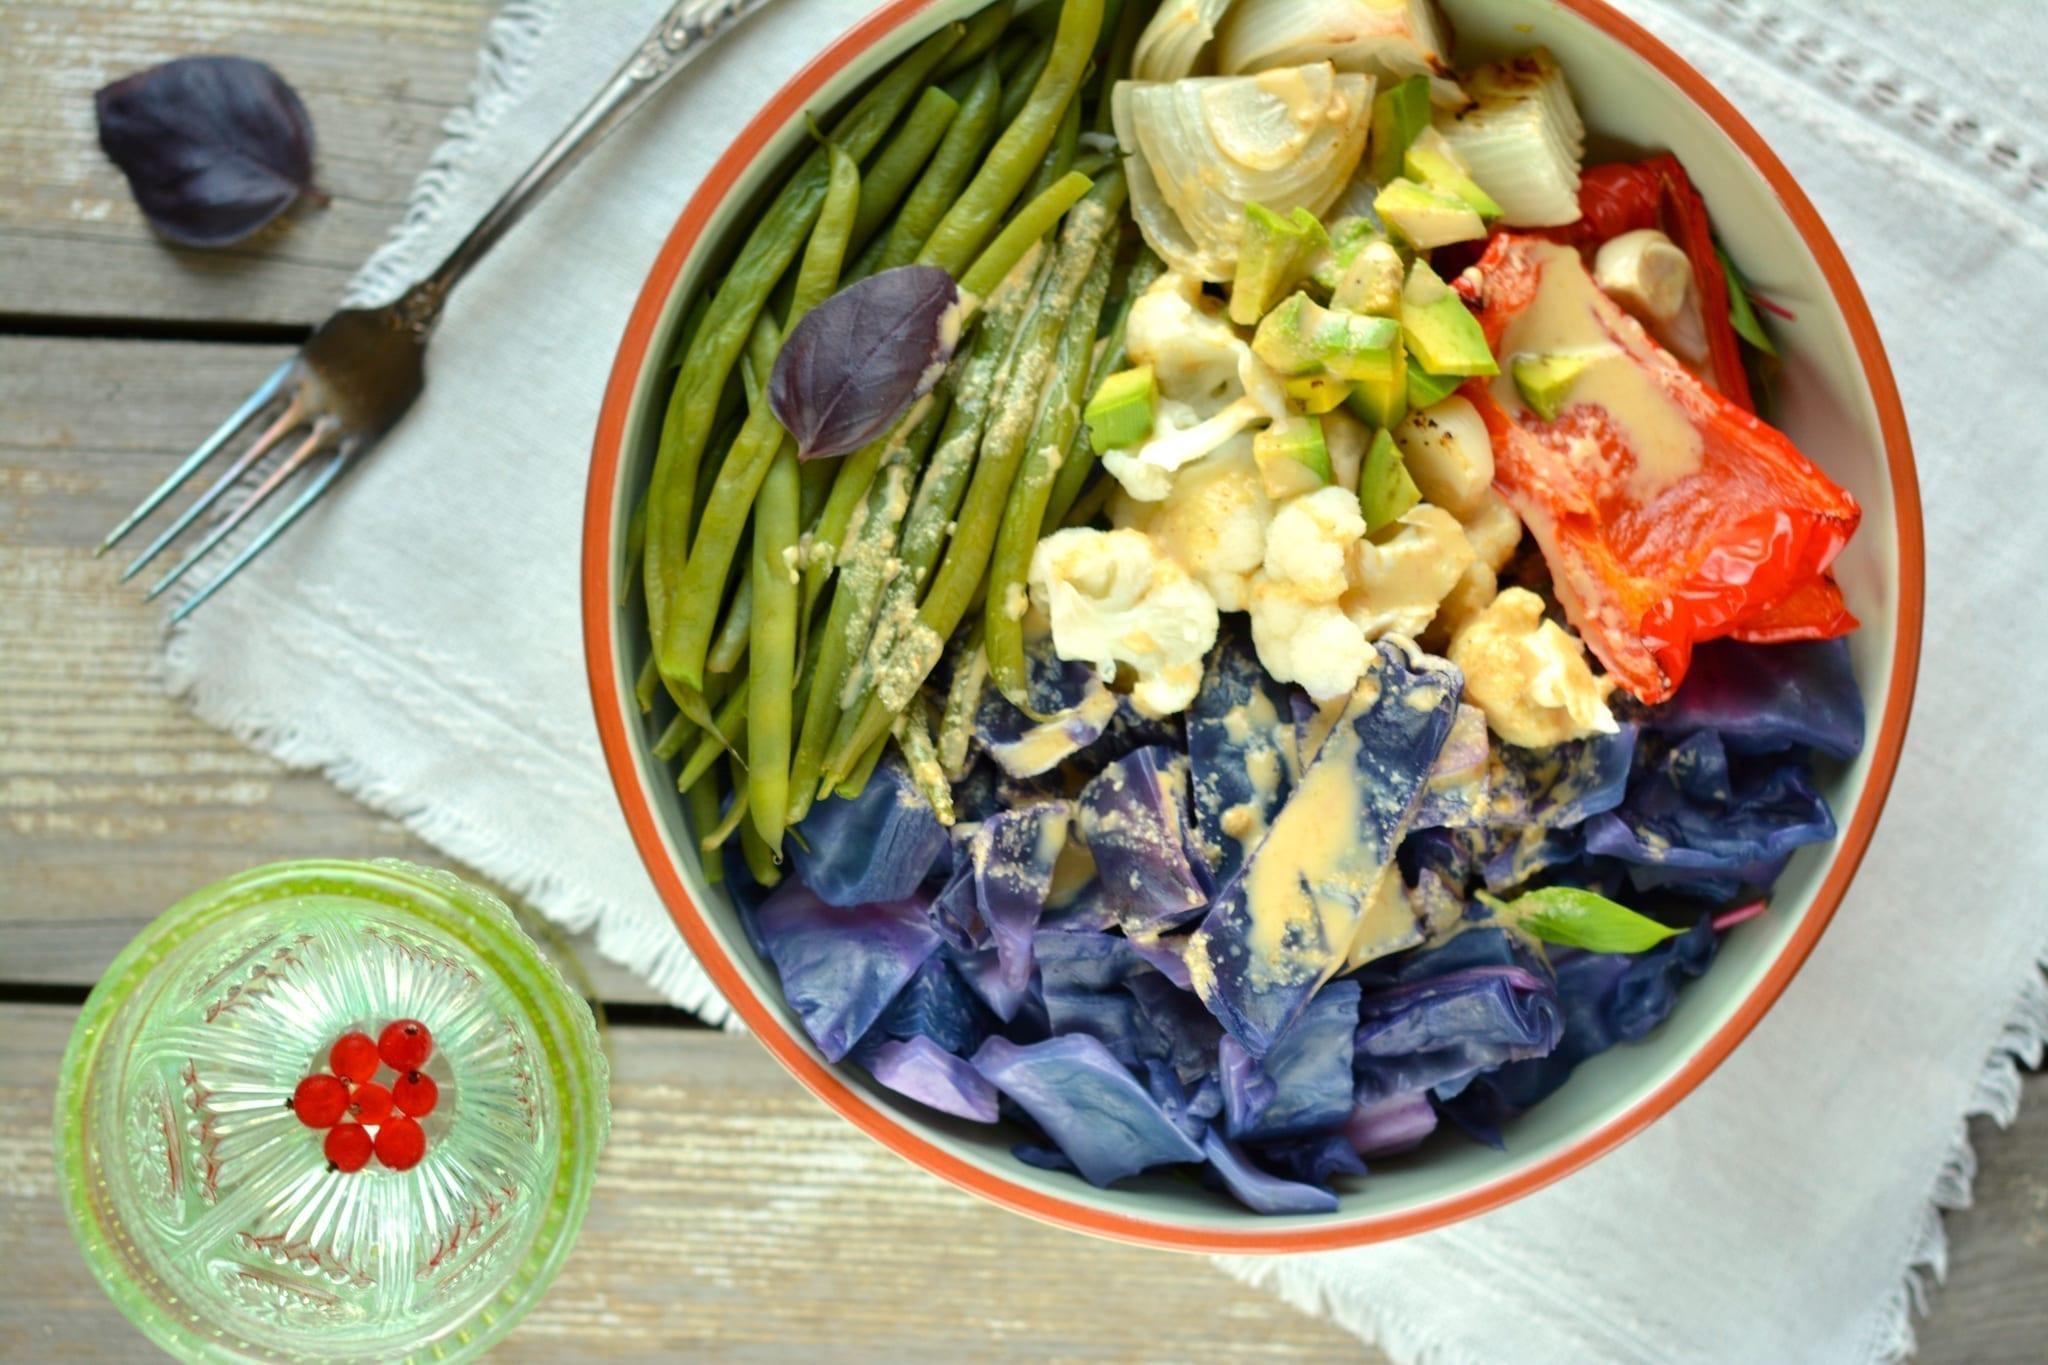 Vegan-Candida-Diet-Buddha-Bowl, vegan candida diet meal plans